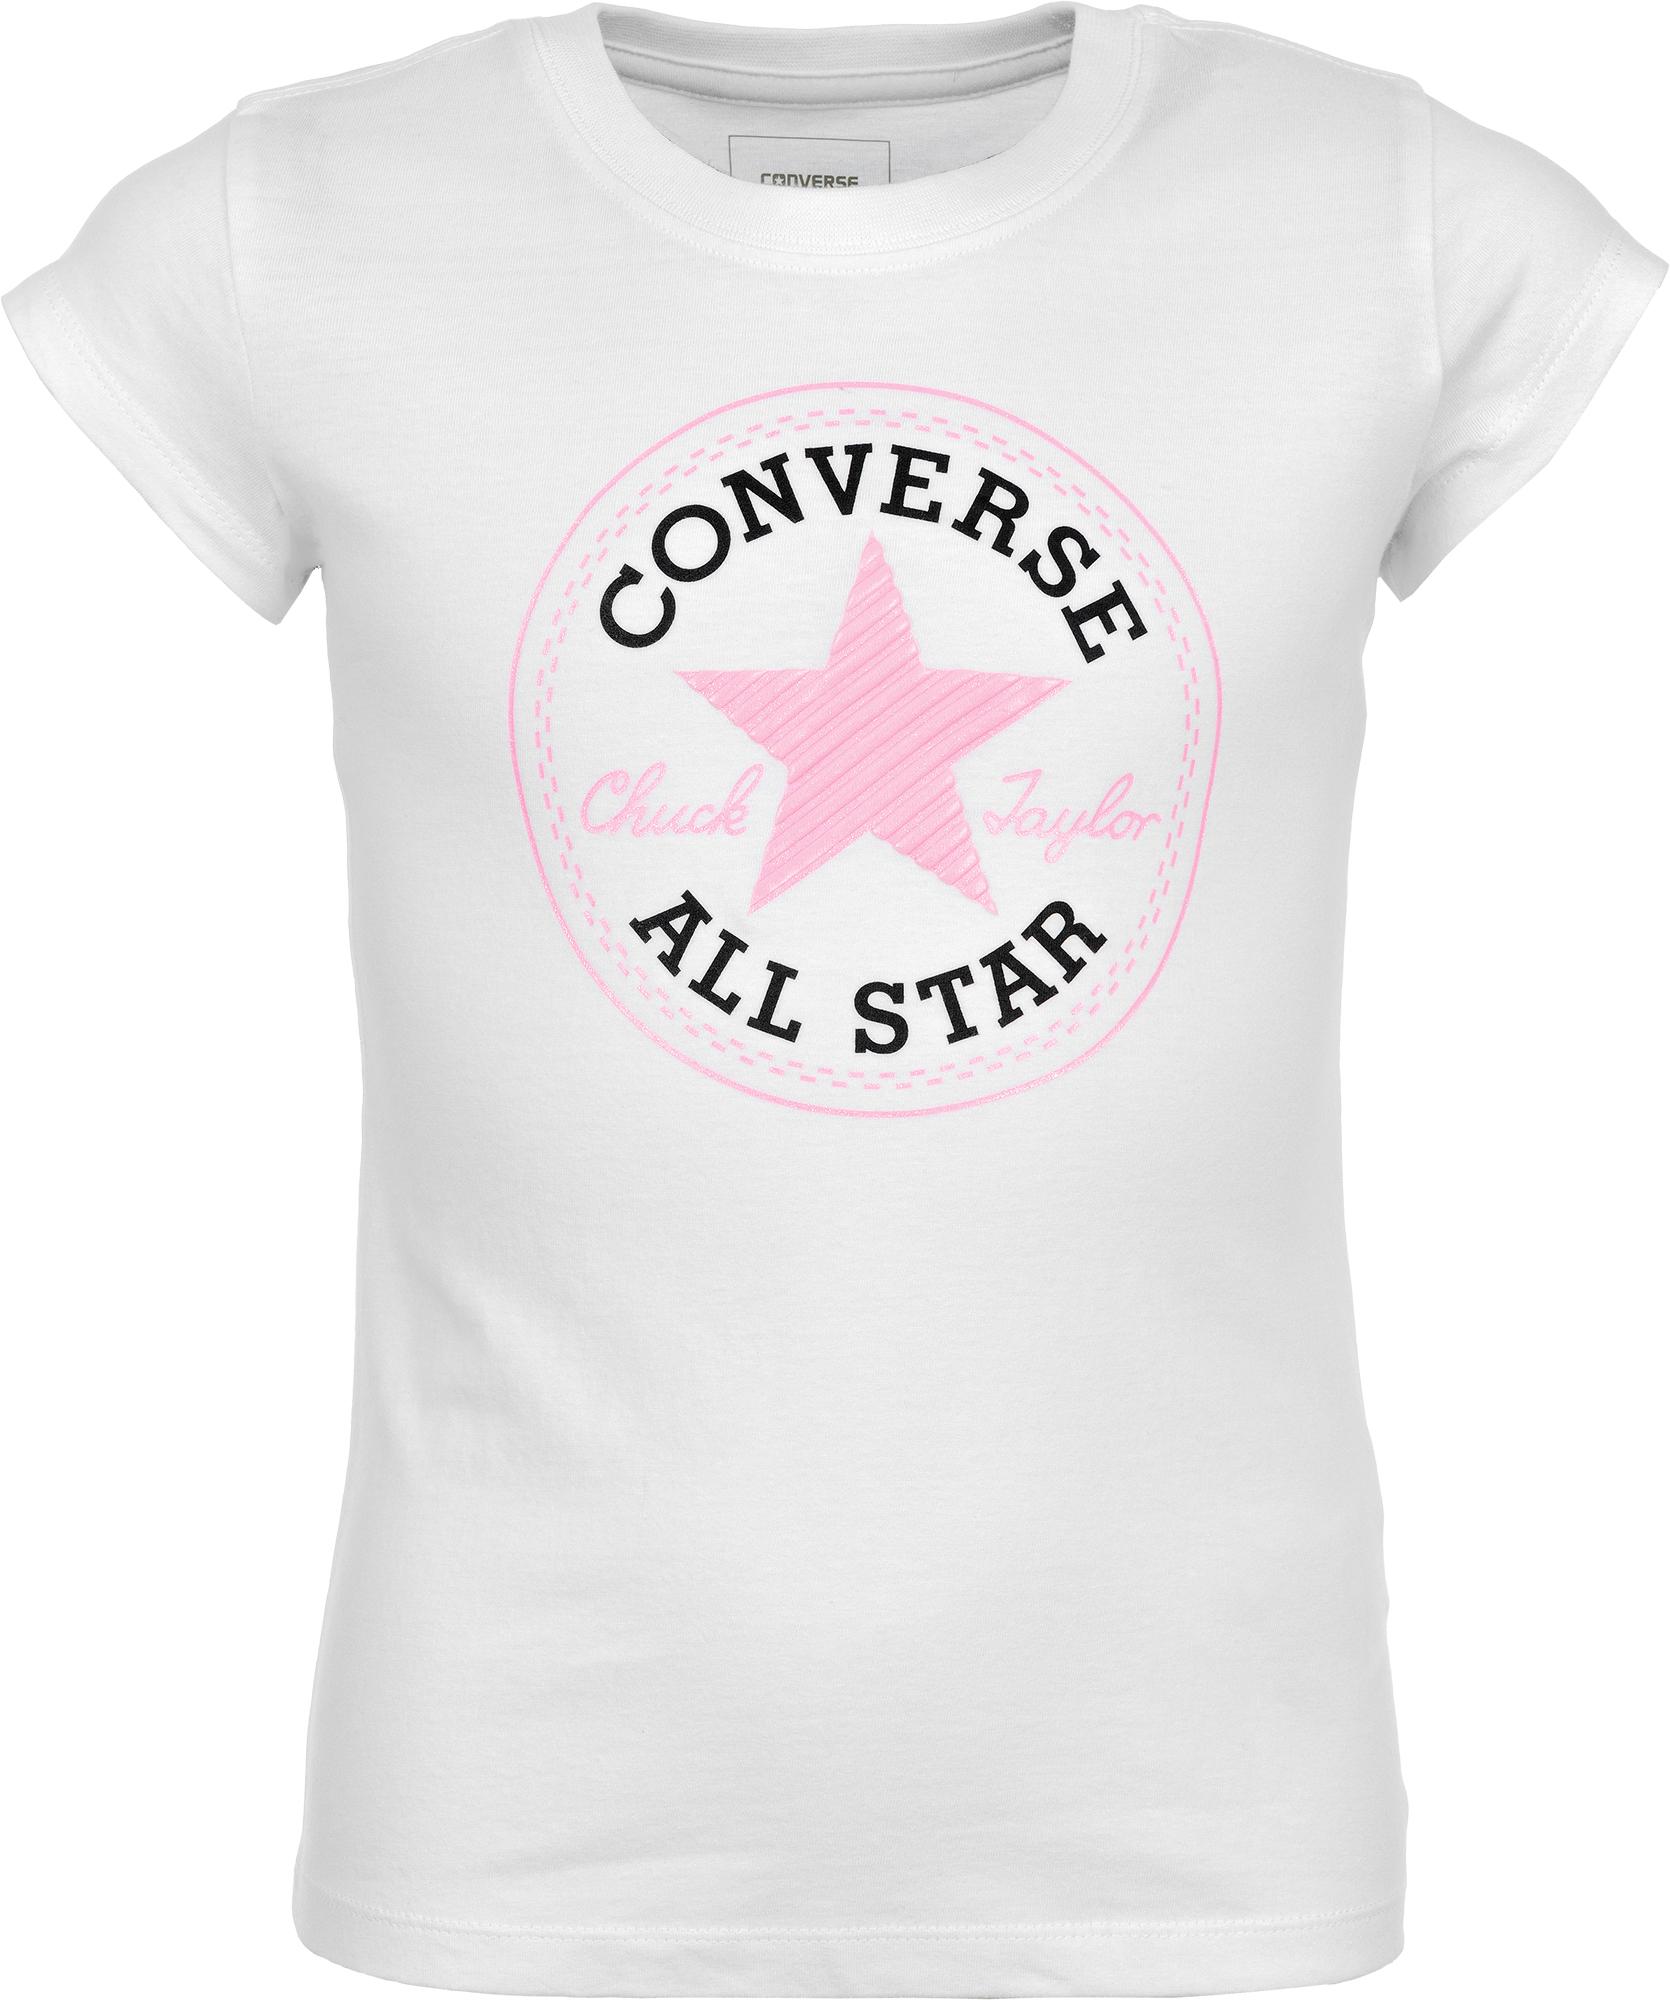 Converse Футболка для девочек Converse converse для детей